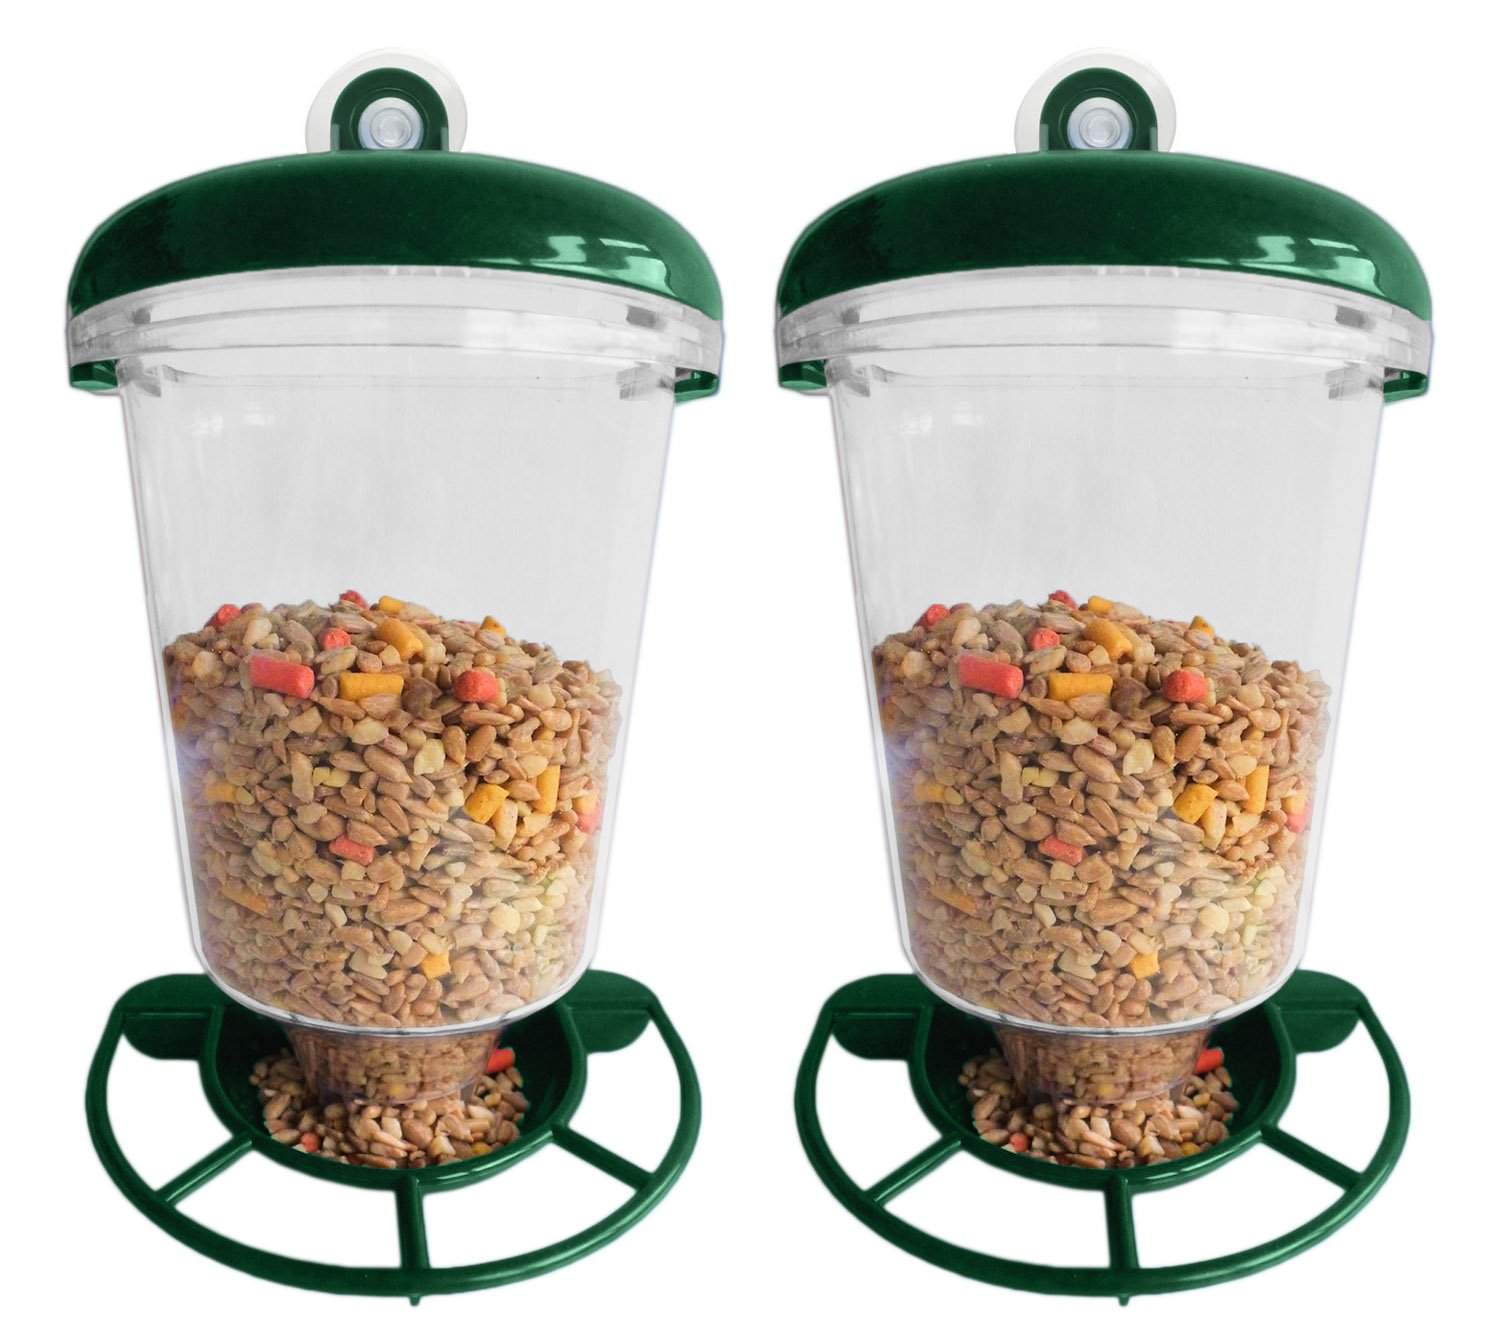 Set of 2 Premium Window Bird Feeders for Wild Birds - Outdoor Use Only - 7.5 x 5.9 x 4.1 - Holds One Pound of Birdseed!